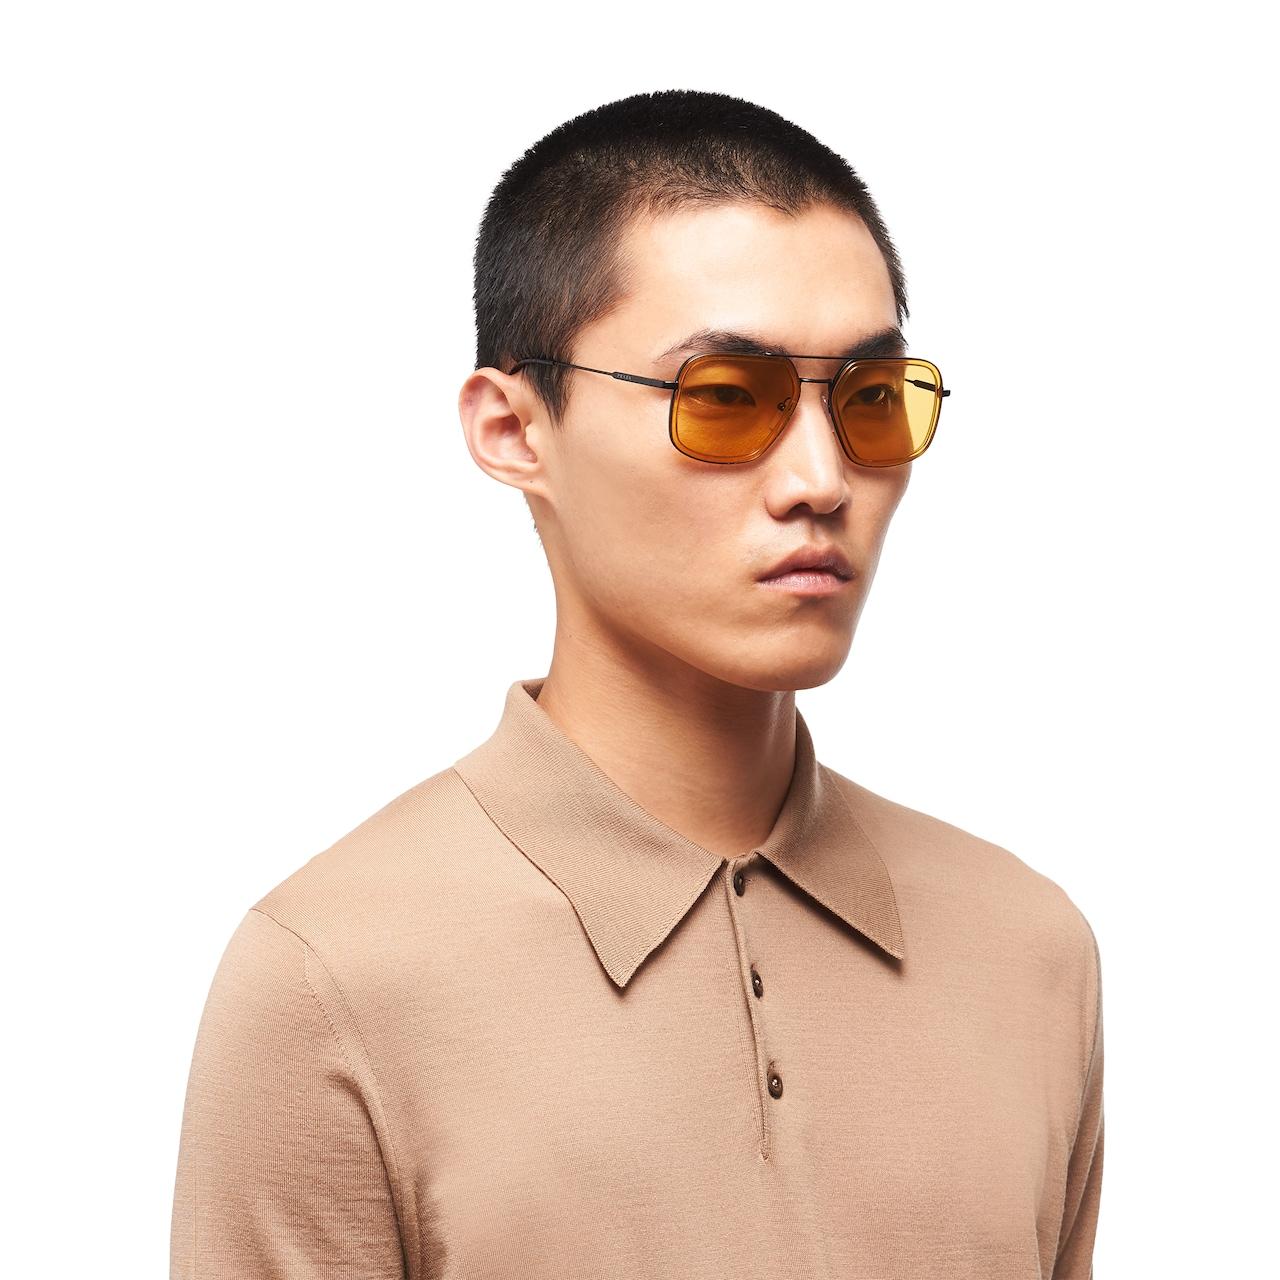 Prada Prada Game sunglasses 2